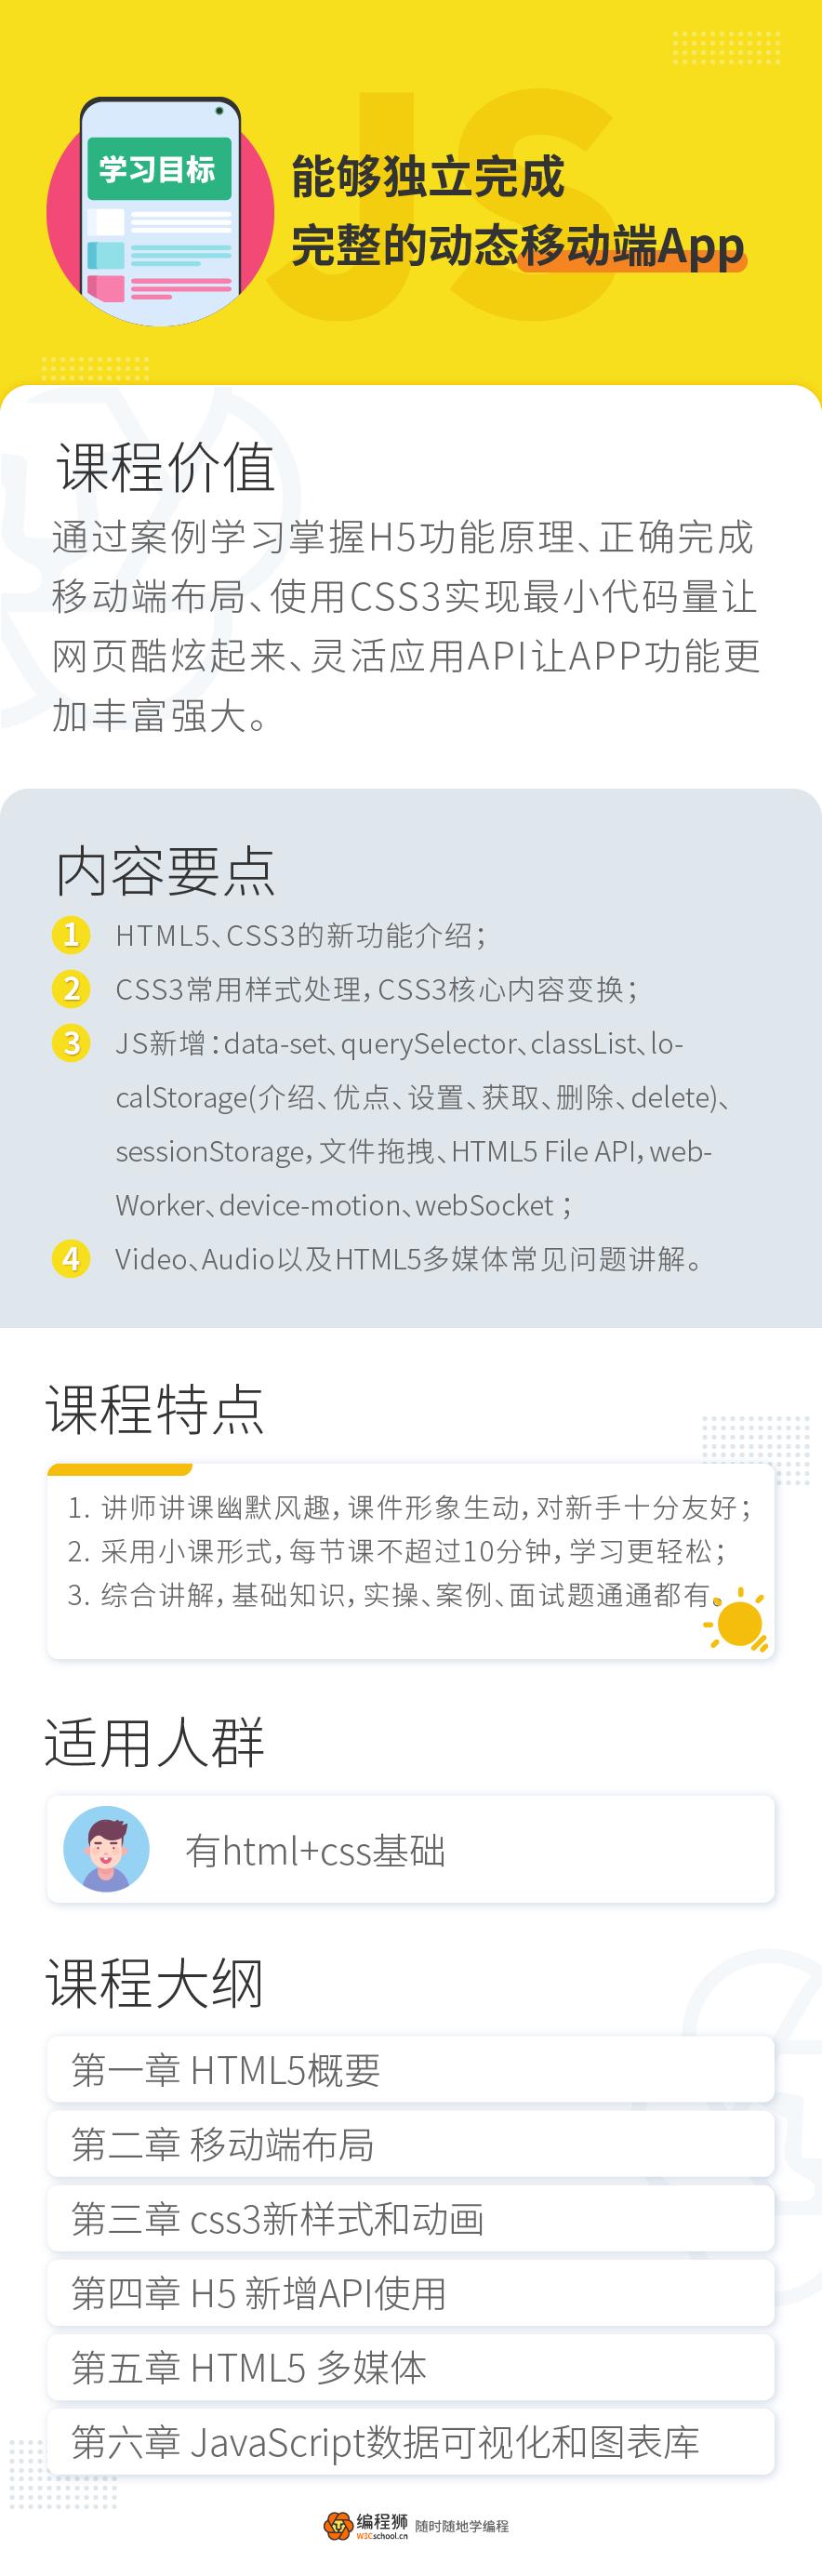 Javascript移動端App實戰開發詳情頁